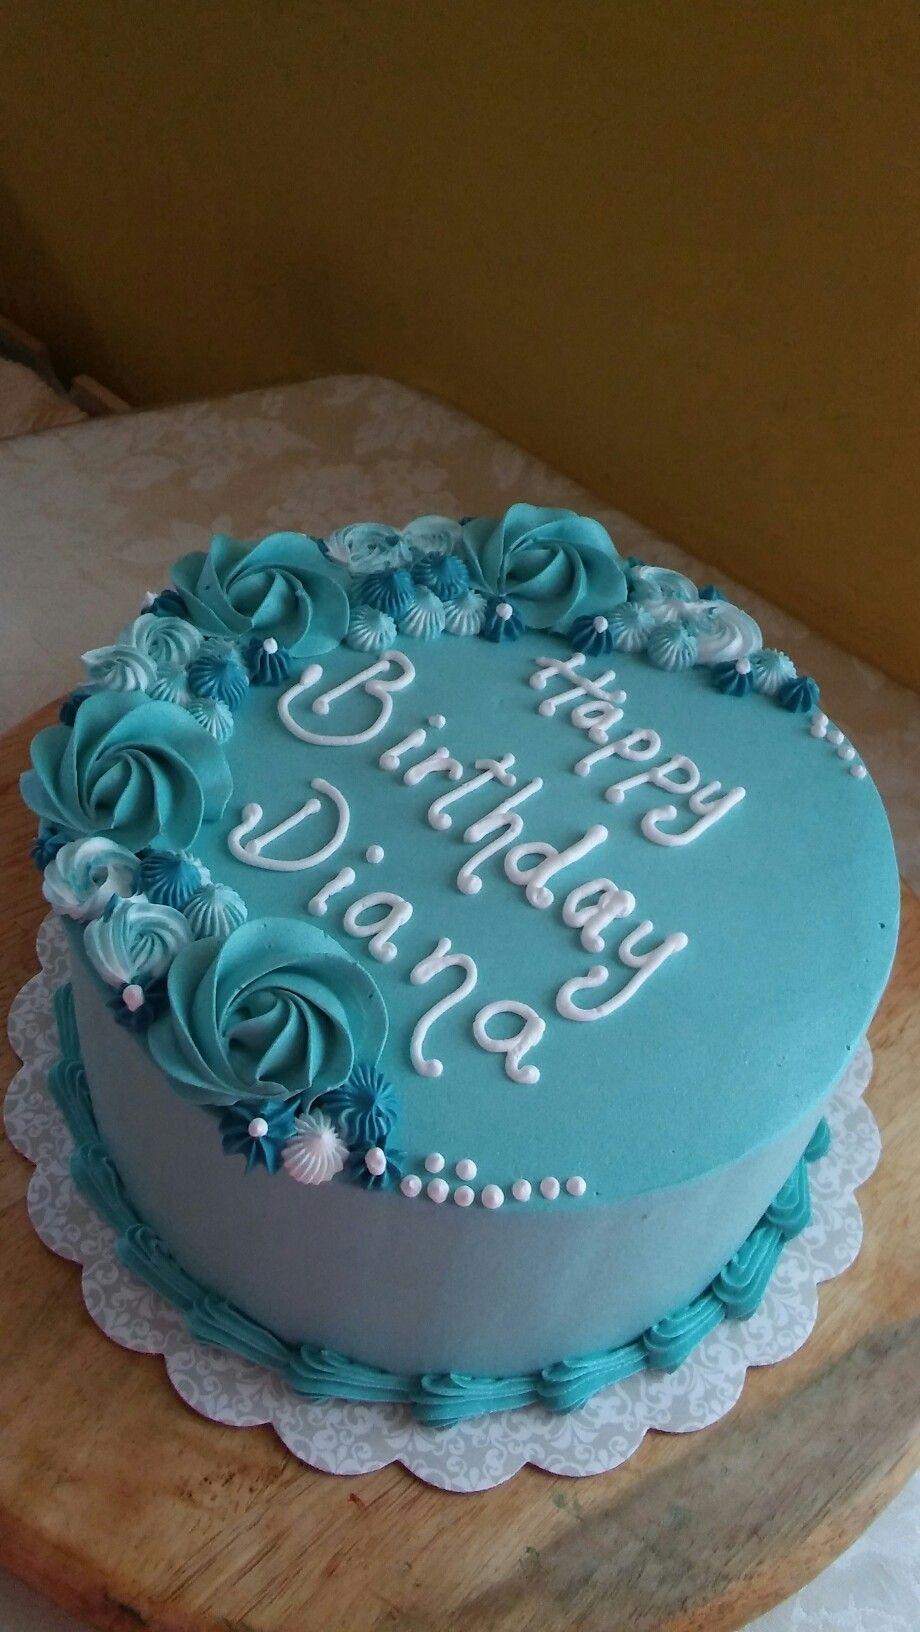 birthday cake decoration Cake decorating designs